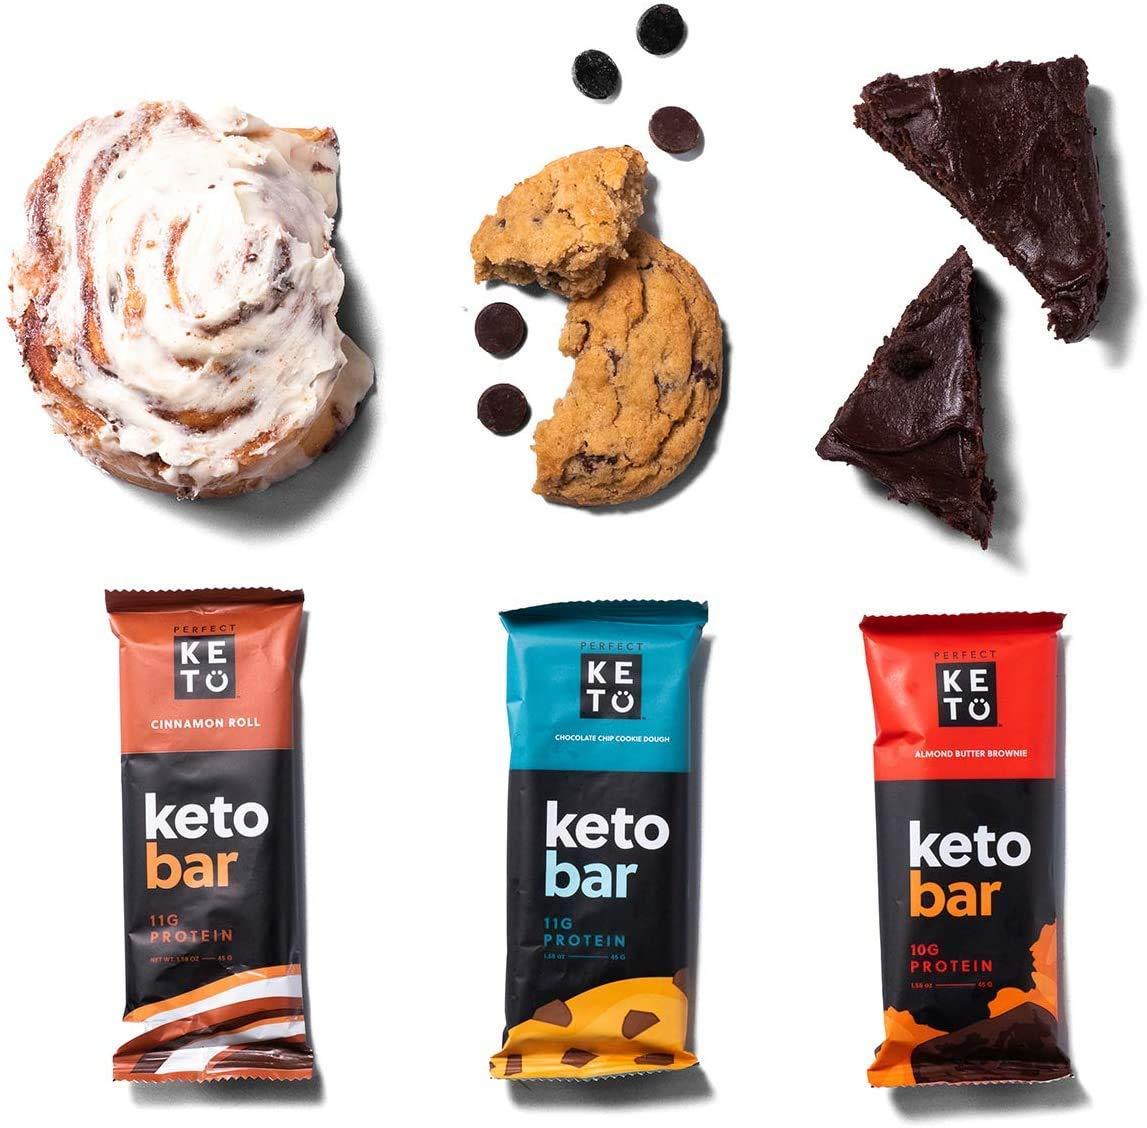 Vegan, Gluten Free, Non-Gmo, Natural, Organic, Keto bars